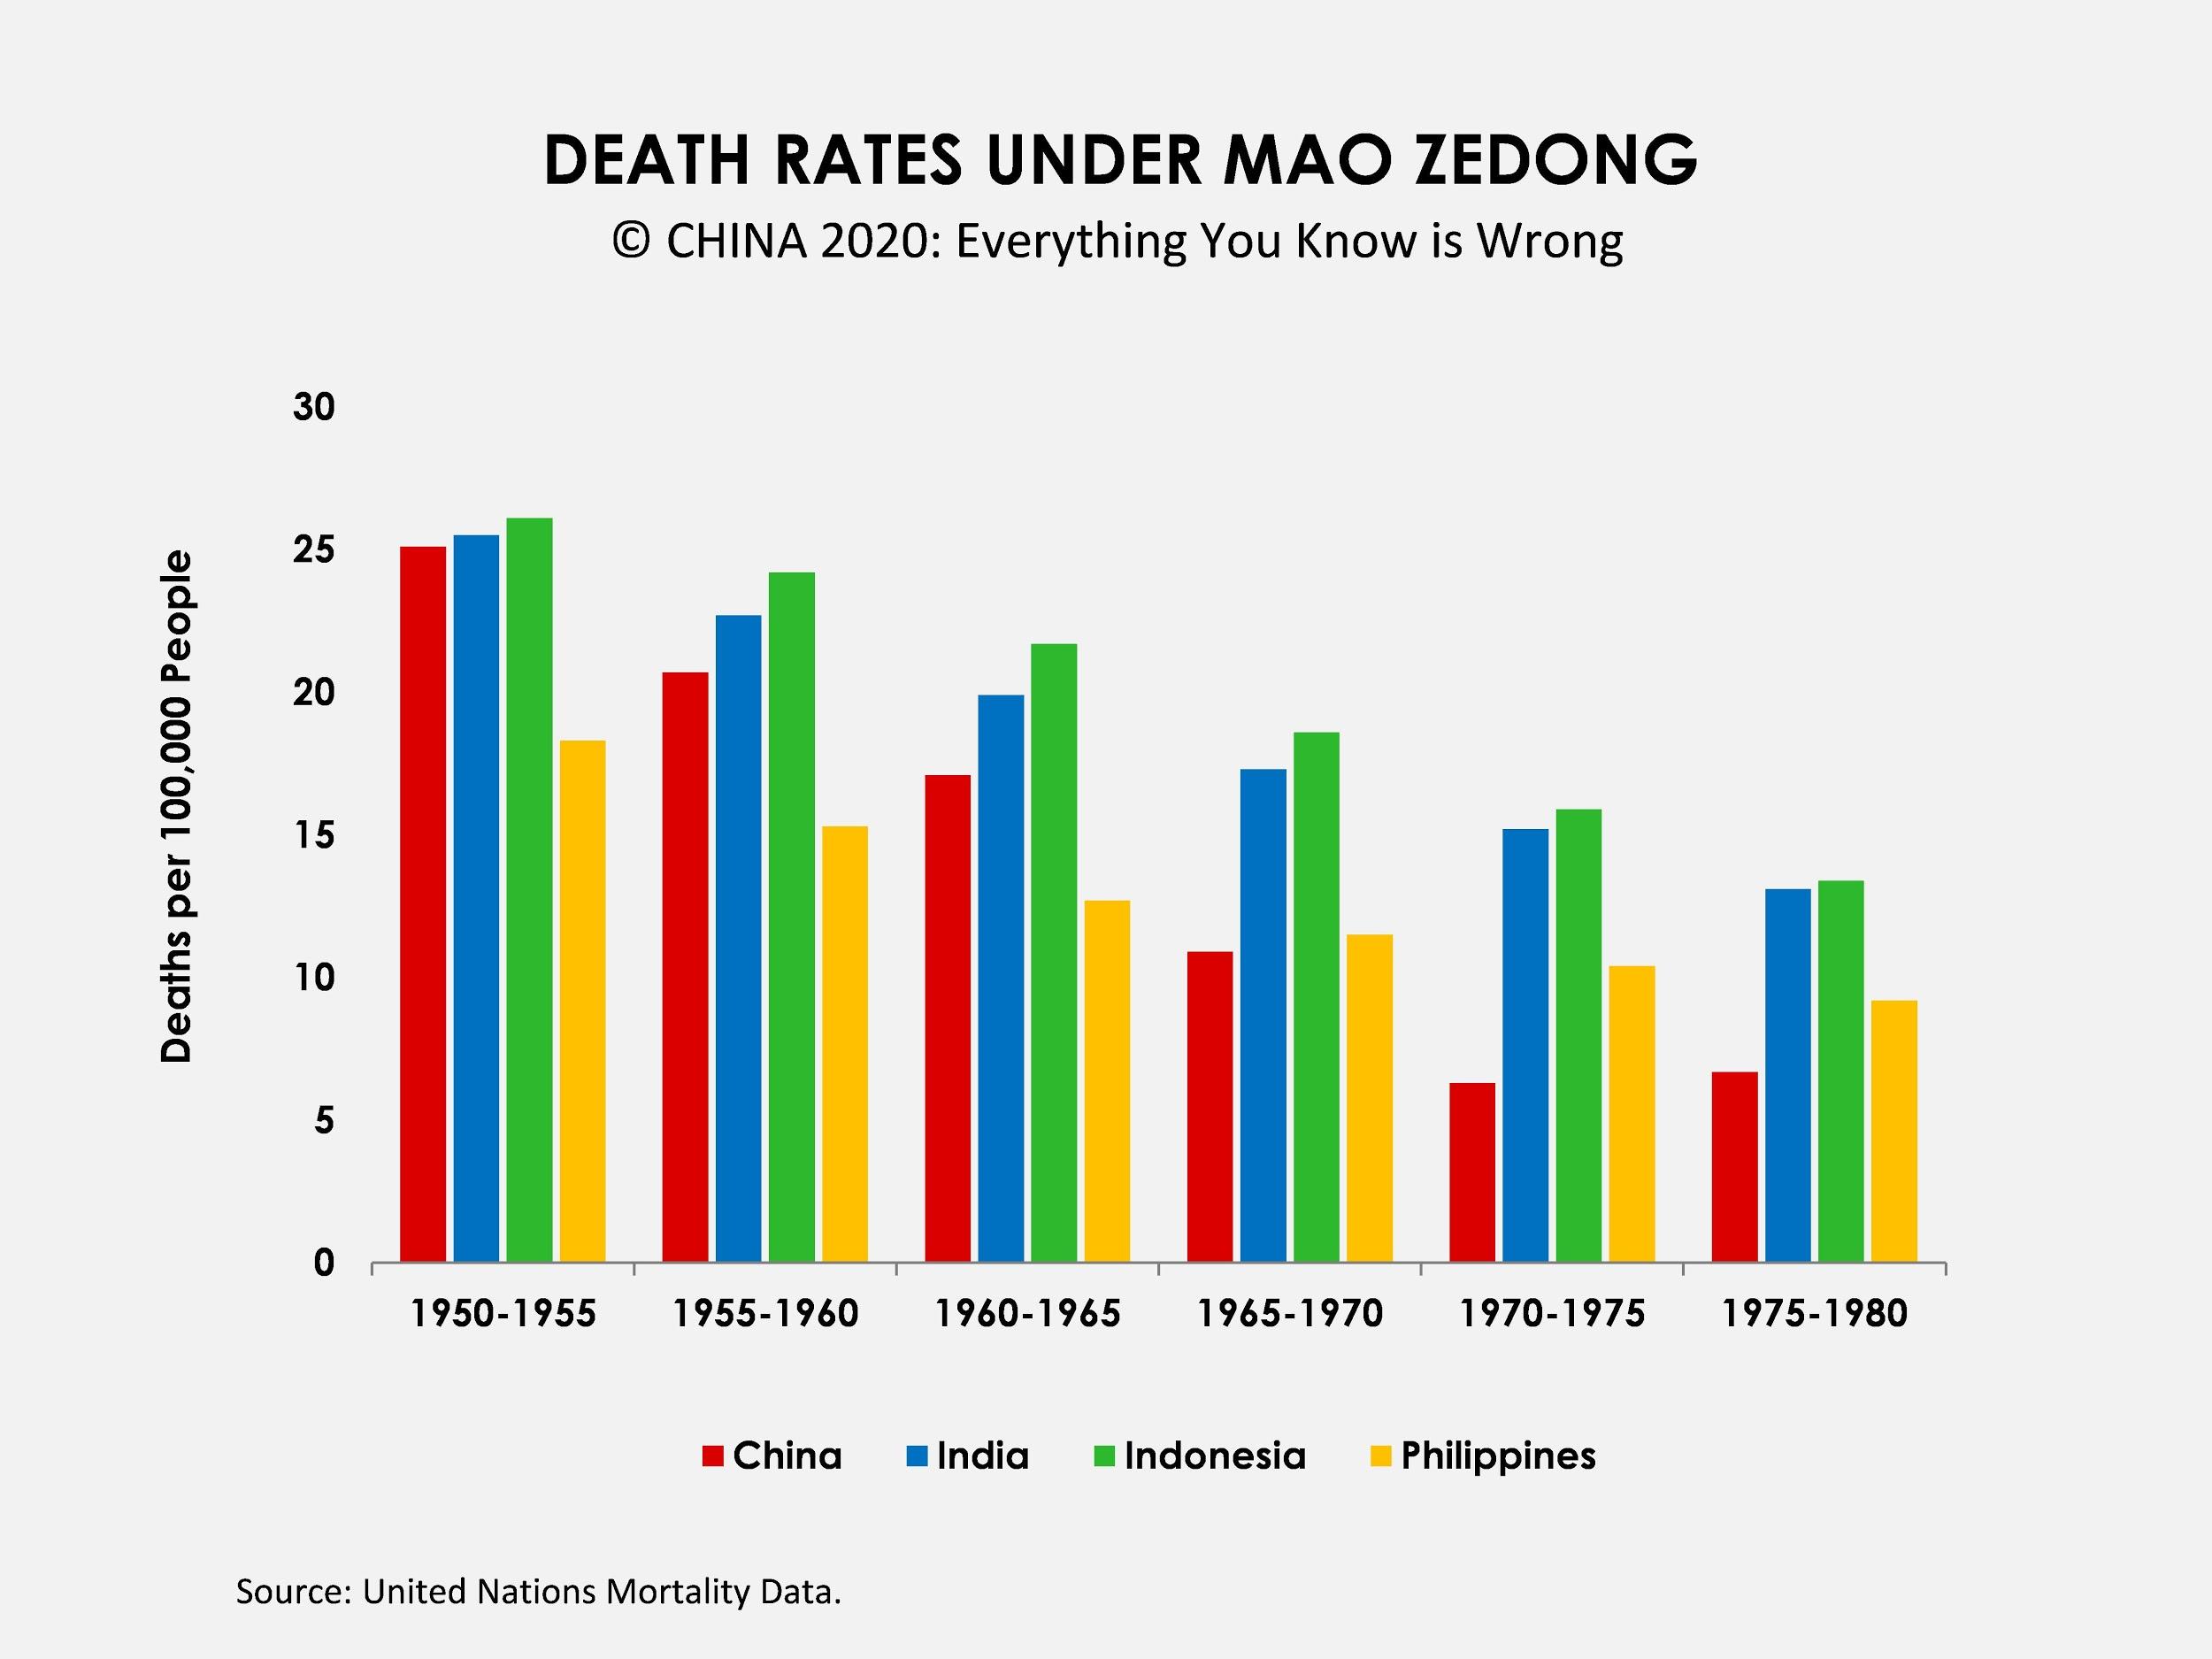 Mao's Great Proletarian Cultural Revolution